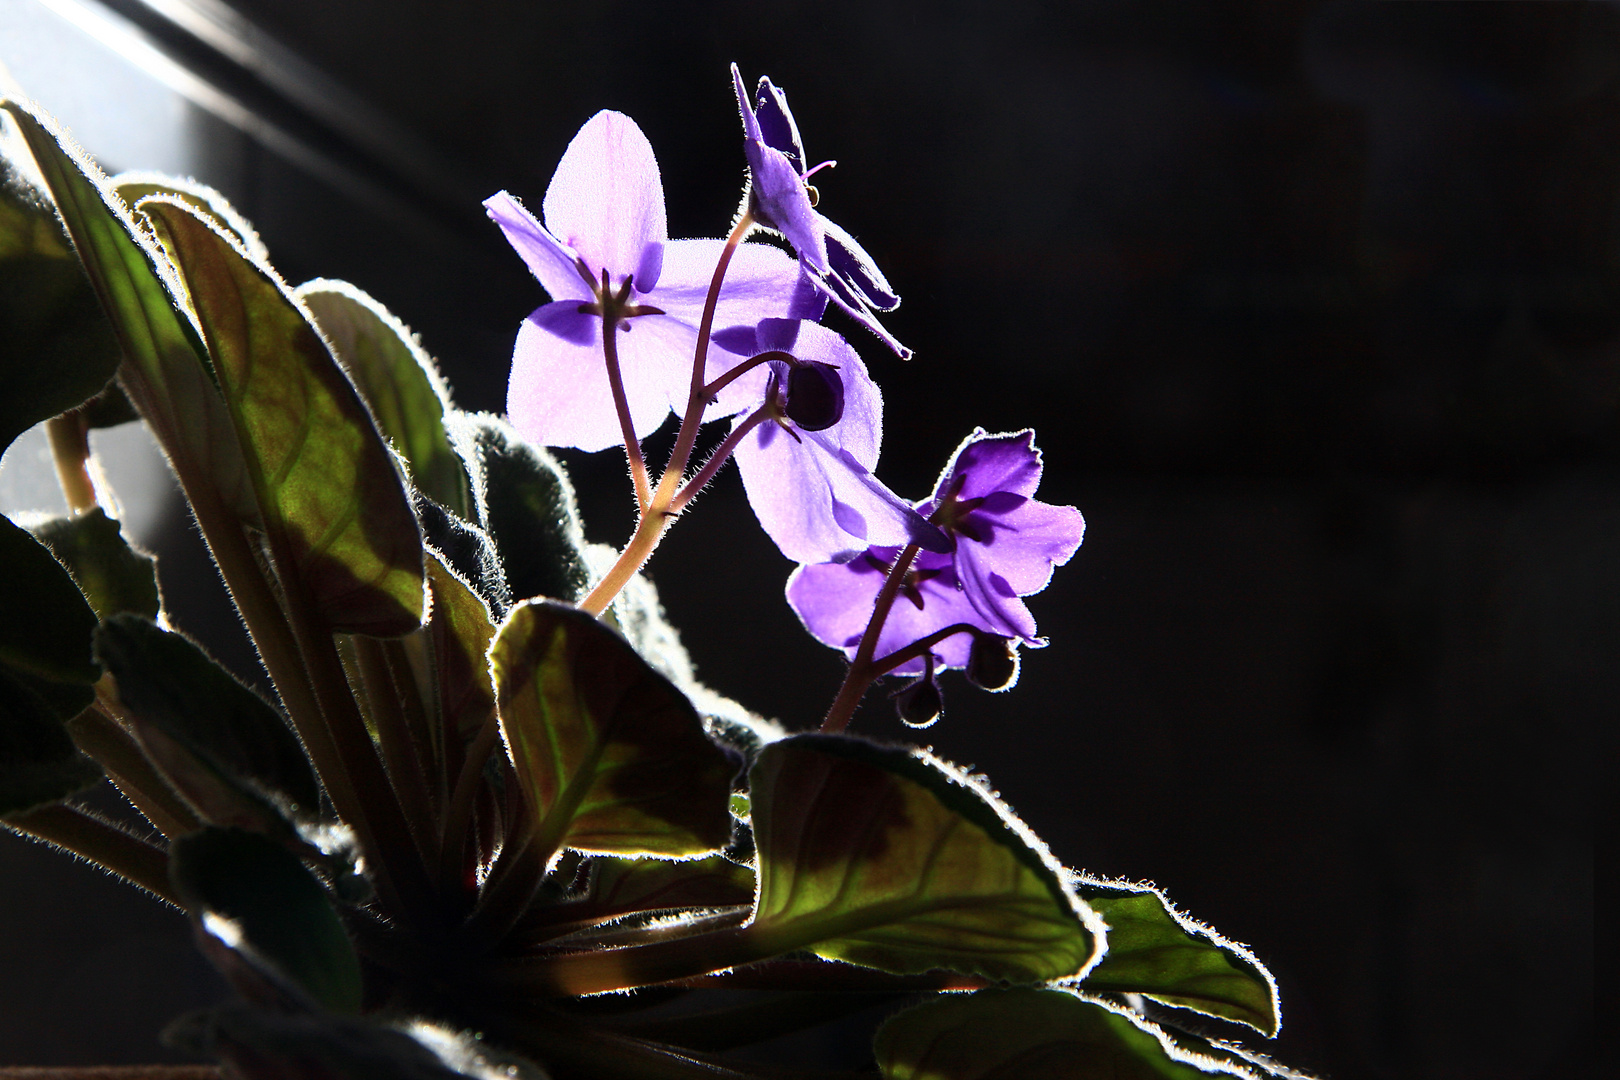 Usumbaraveilchen